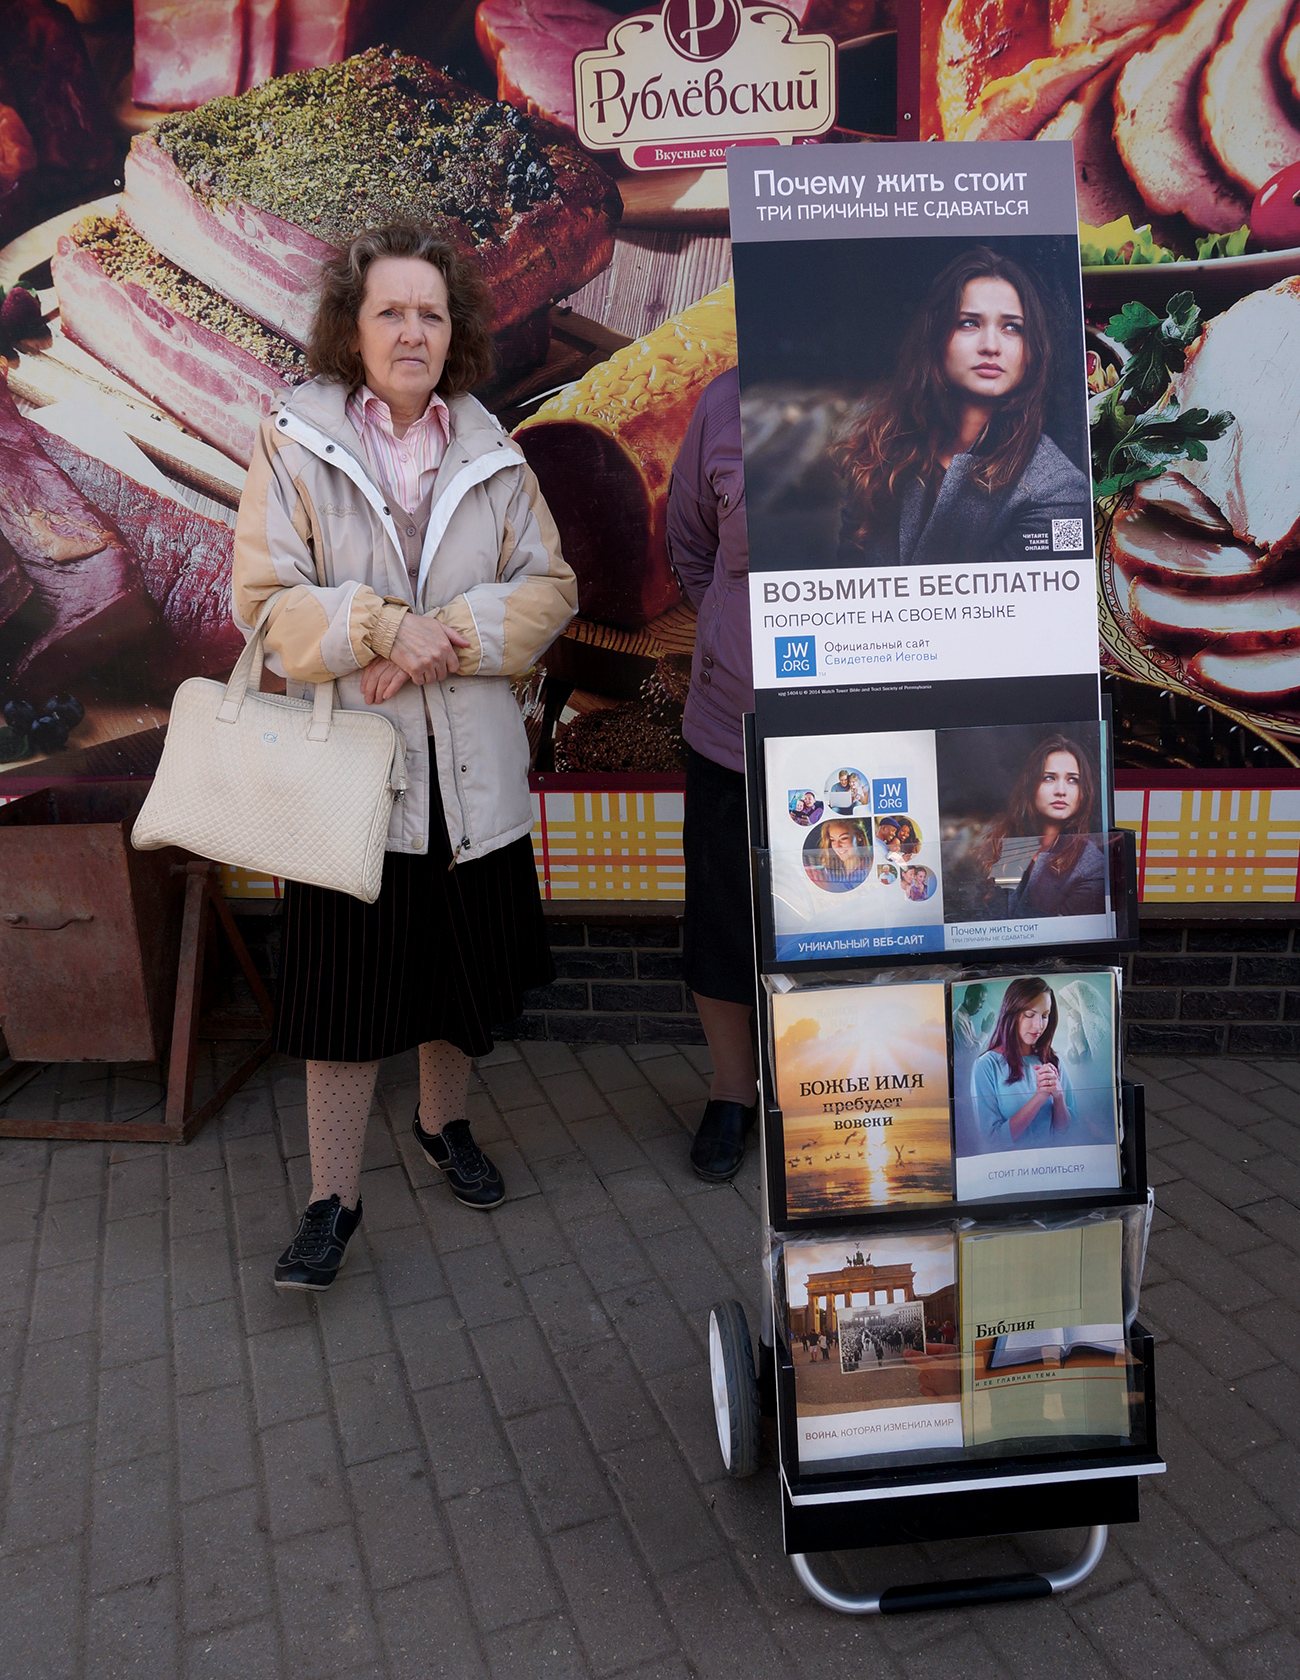 Seorang perempuan menawarkan buku Saksi-saksi Yehuwa. Sumber: Alexander Artemenkov / TASS